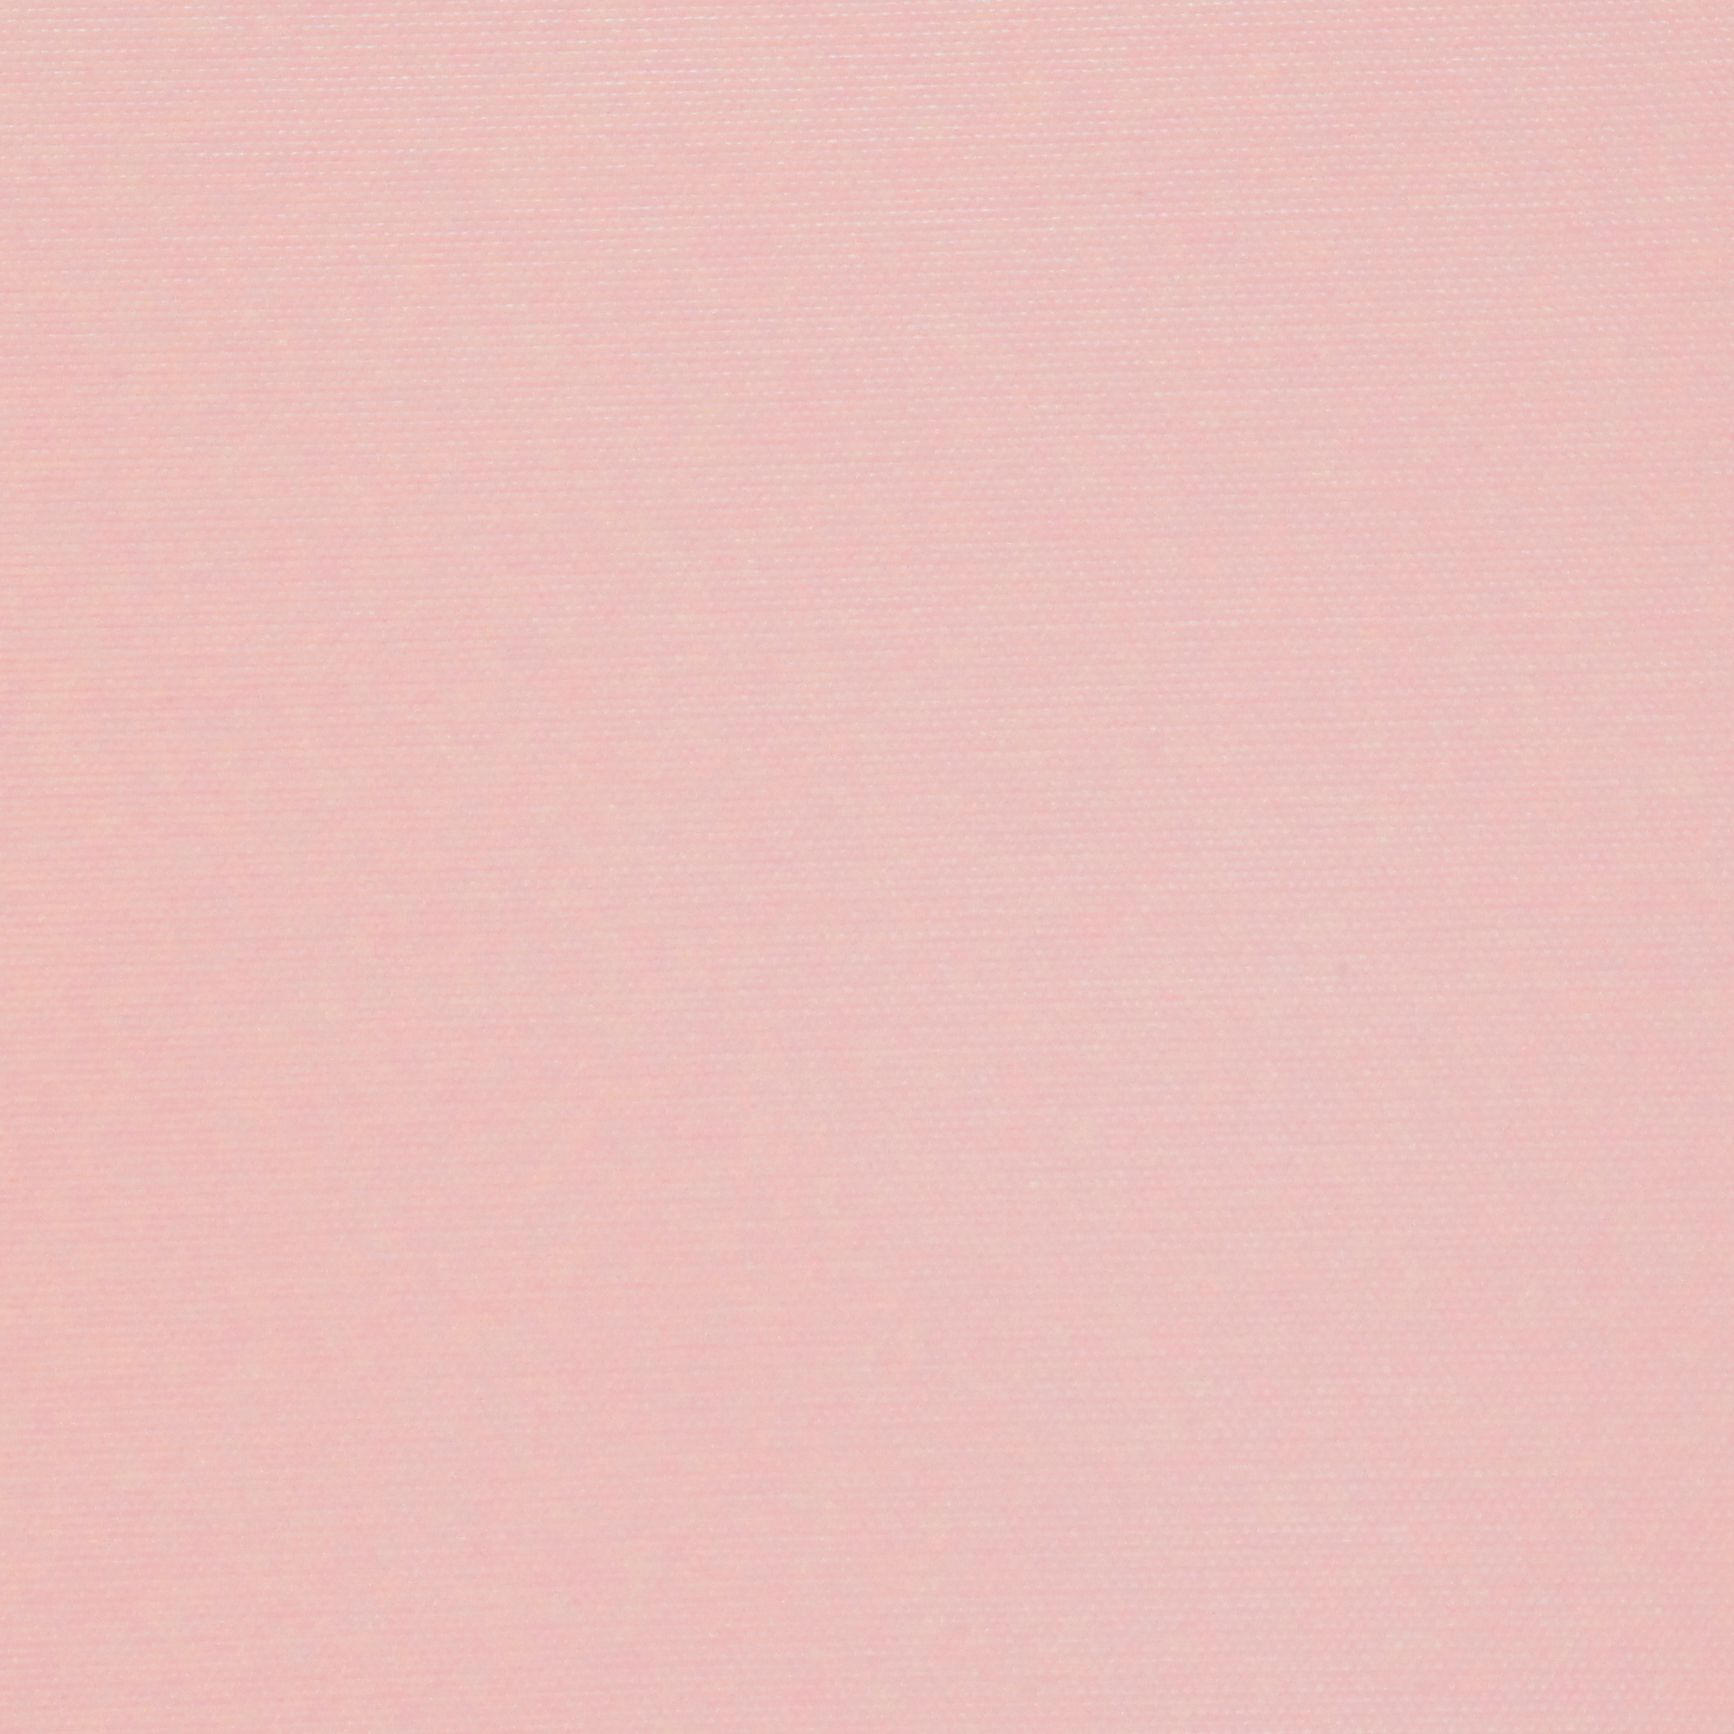 Colour theme: Champagne Pink